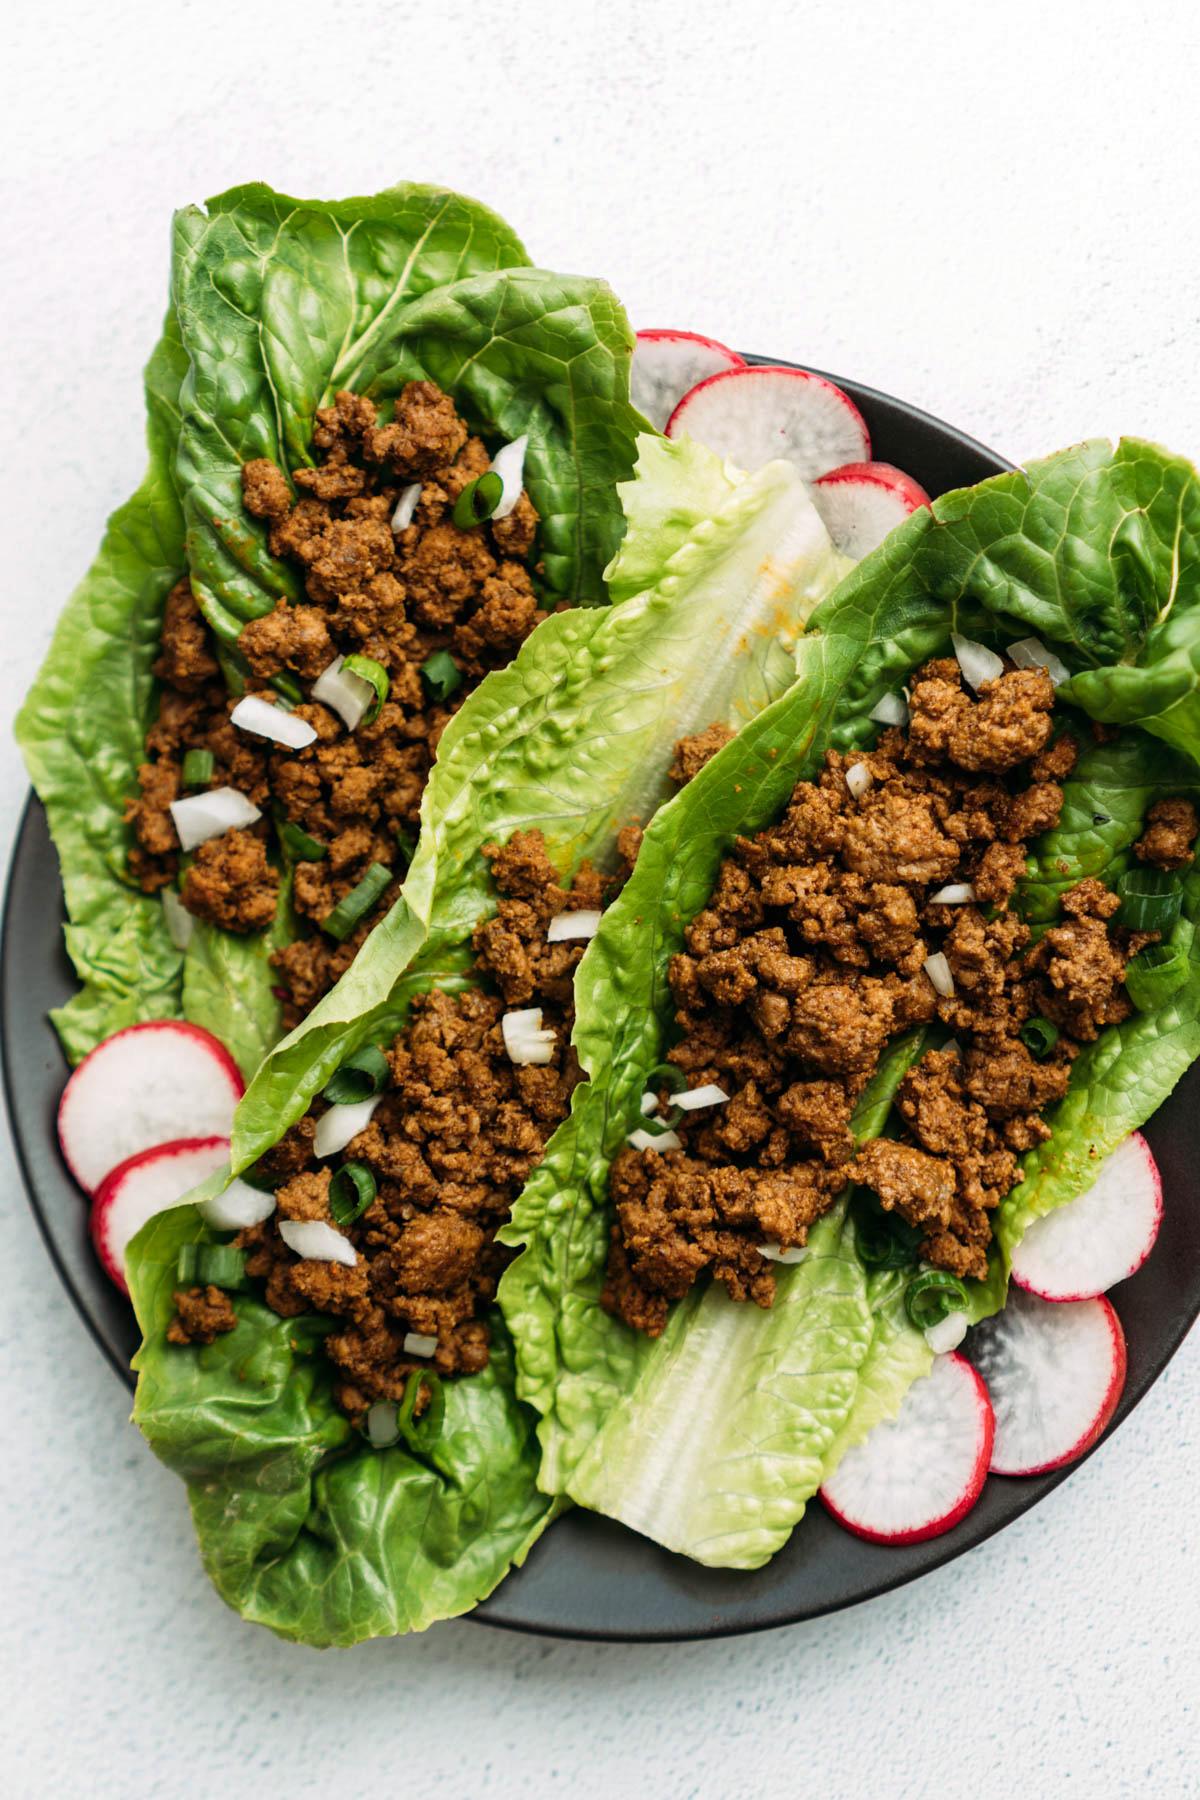 Keto taco meat in lettuce leaf wrap on plate.